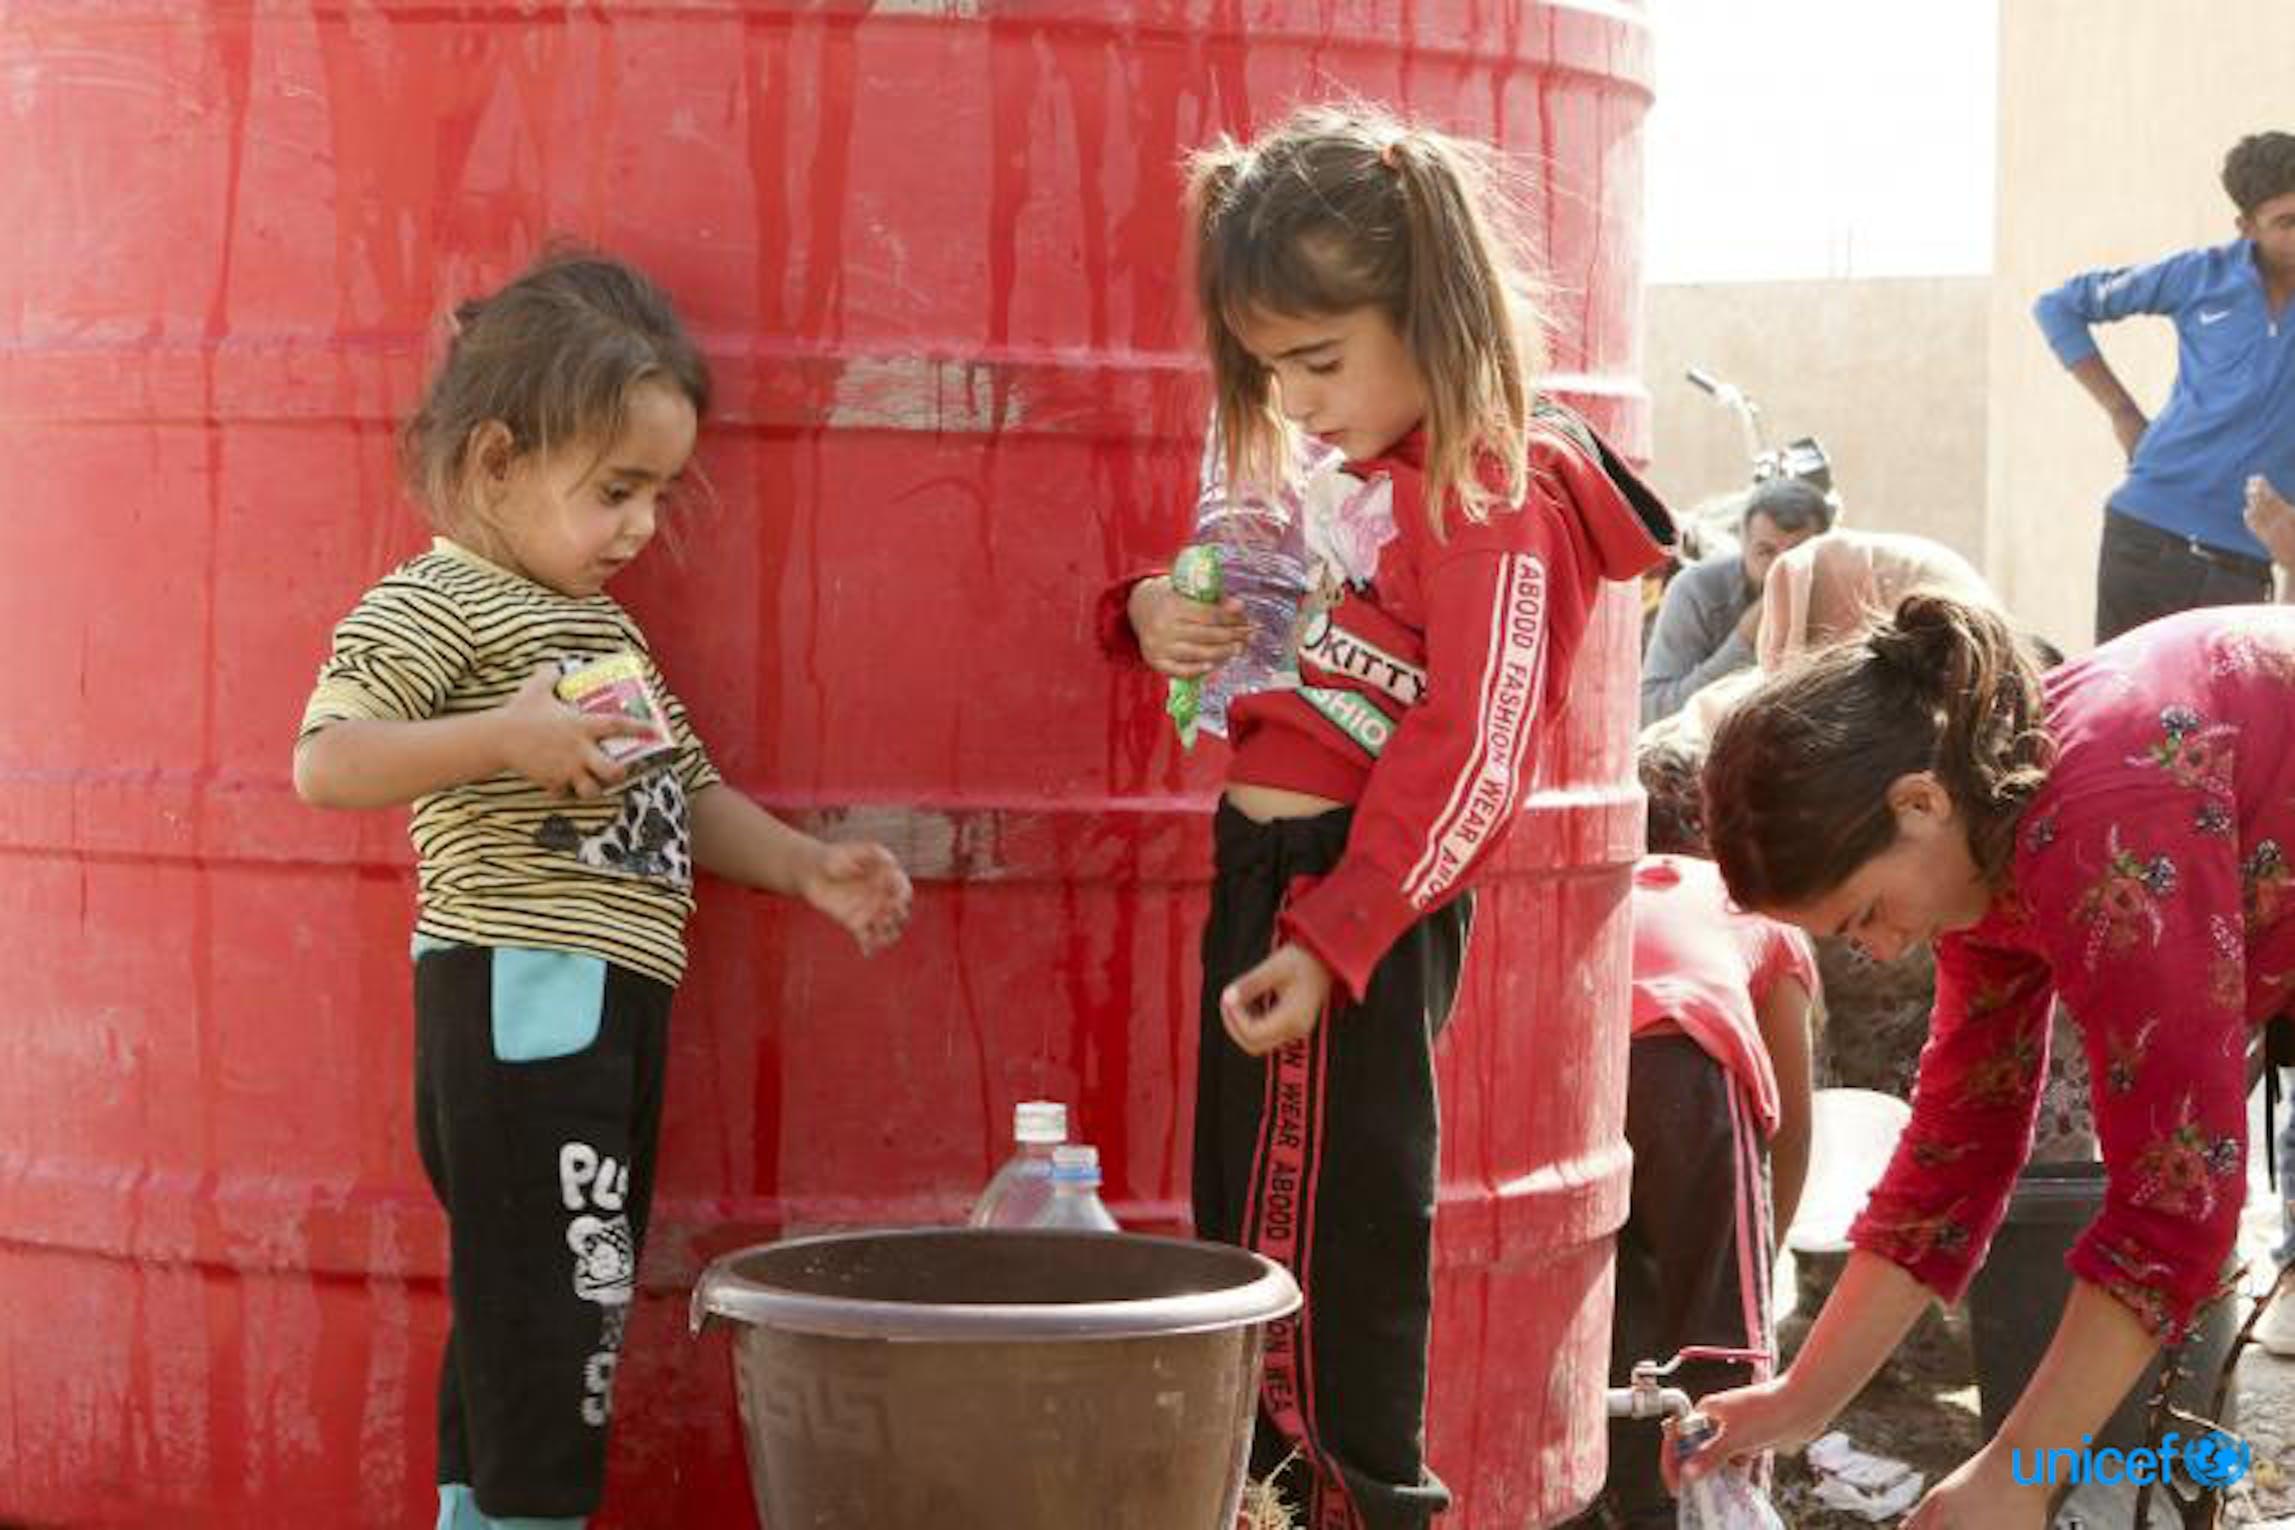 UNICEF/Hasan